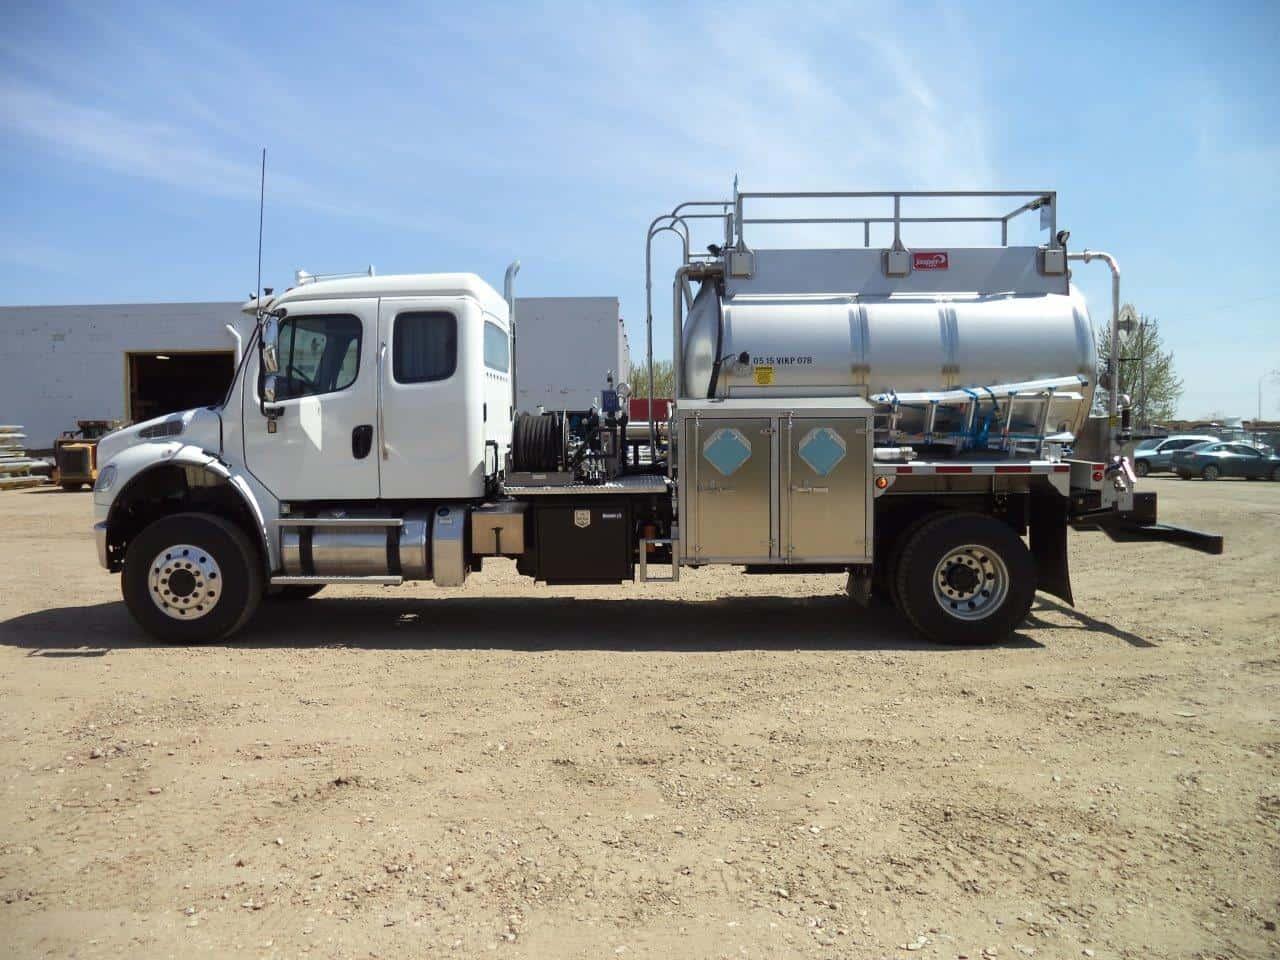 SS304 Round TC407 Pressure Truck